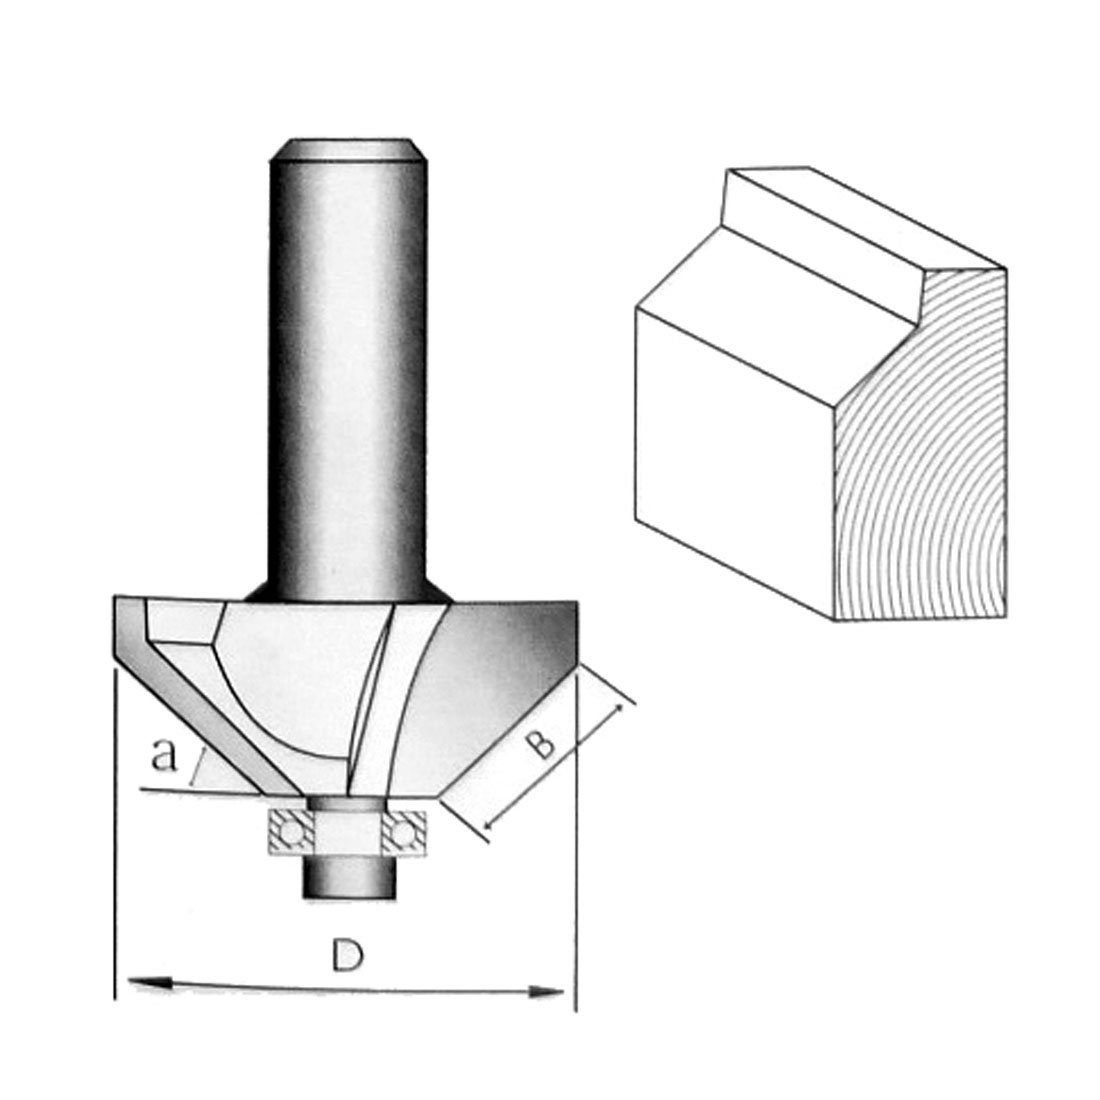 uxcell 1//4-inch Shank 1//2-inch Cut Long Ball Bearing 45 Degree Chamfer Router Bit